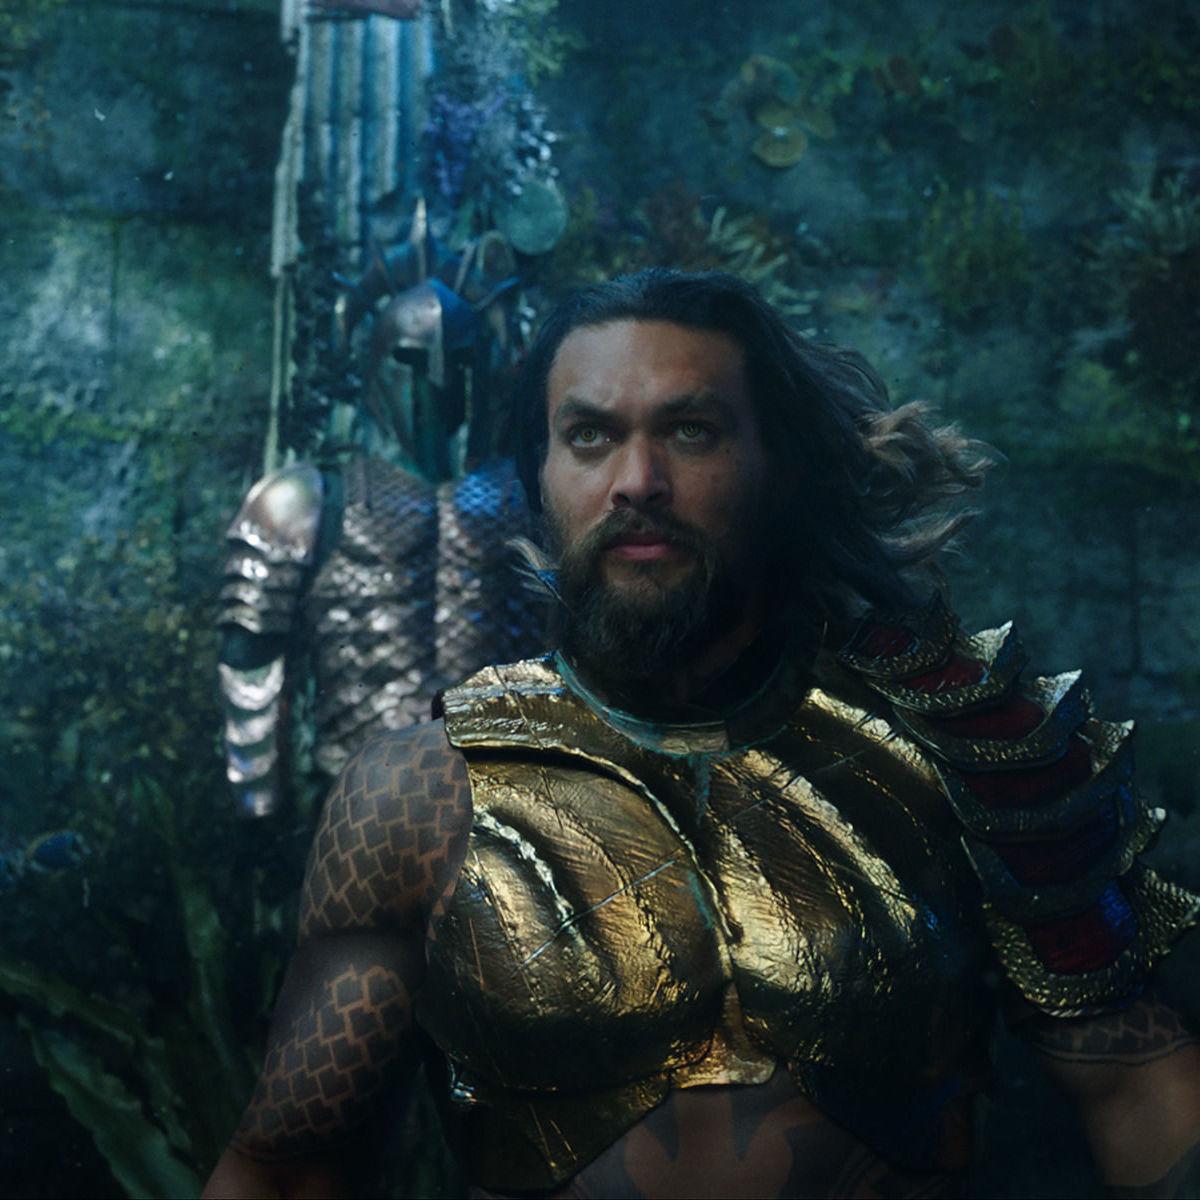 James Momoa: James Wan Shows New Aquaman Scenes, Details More Of The